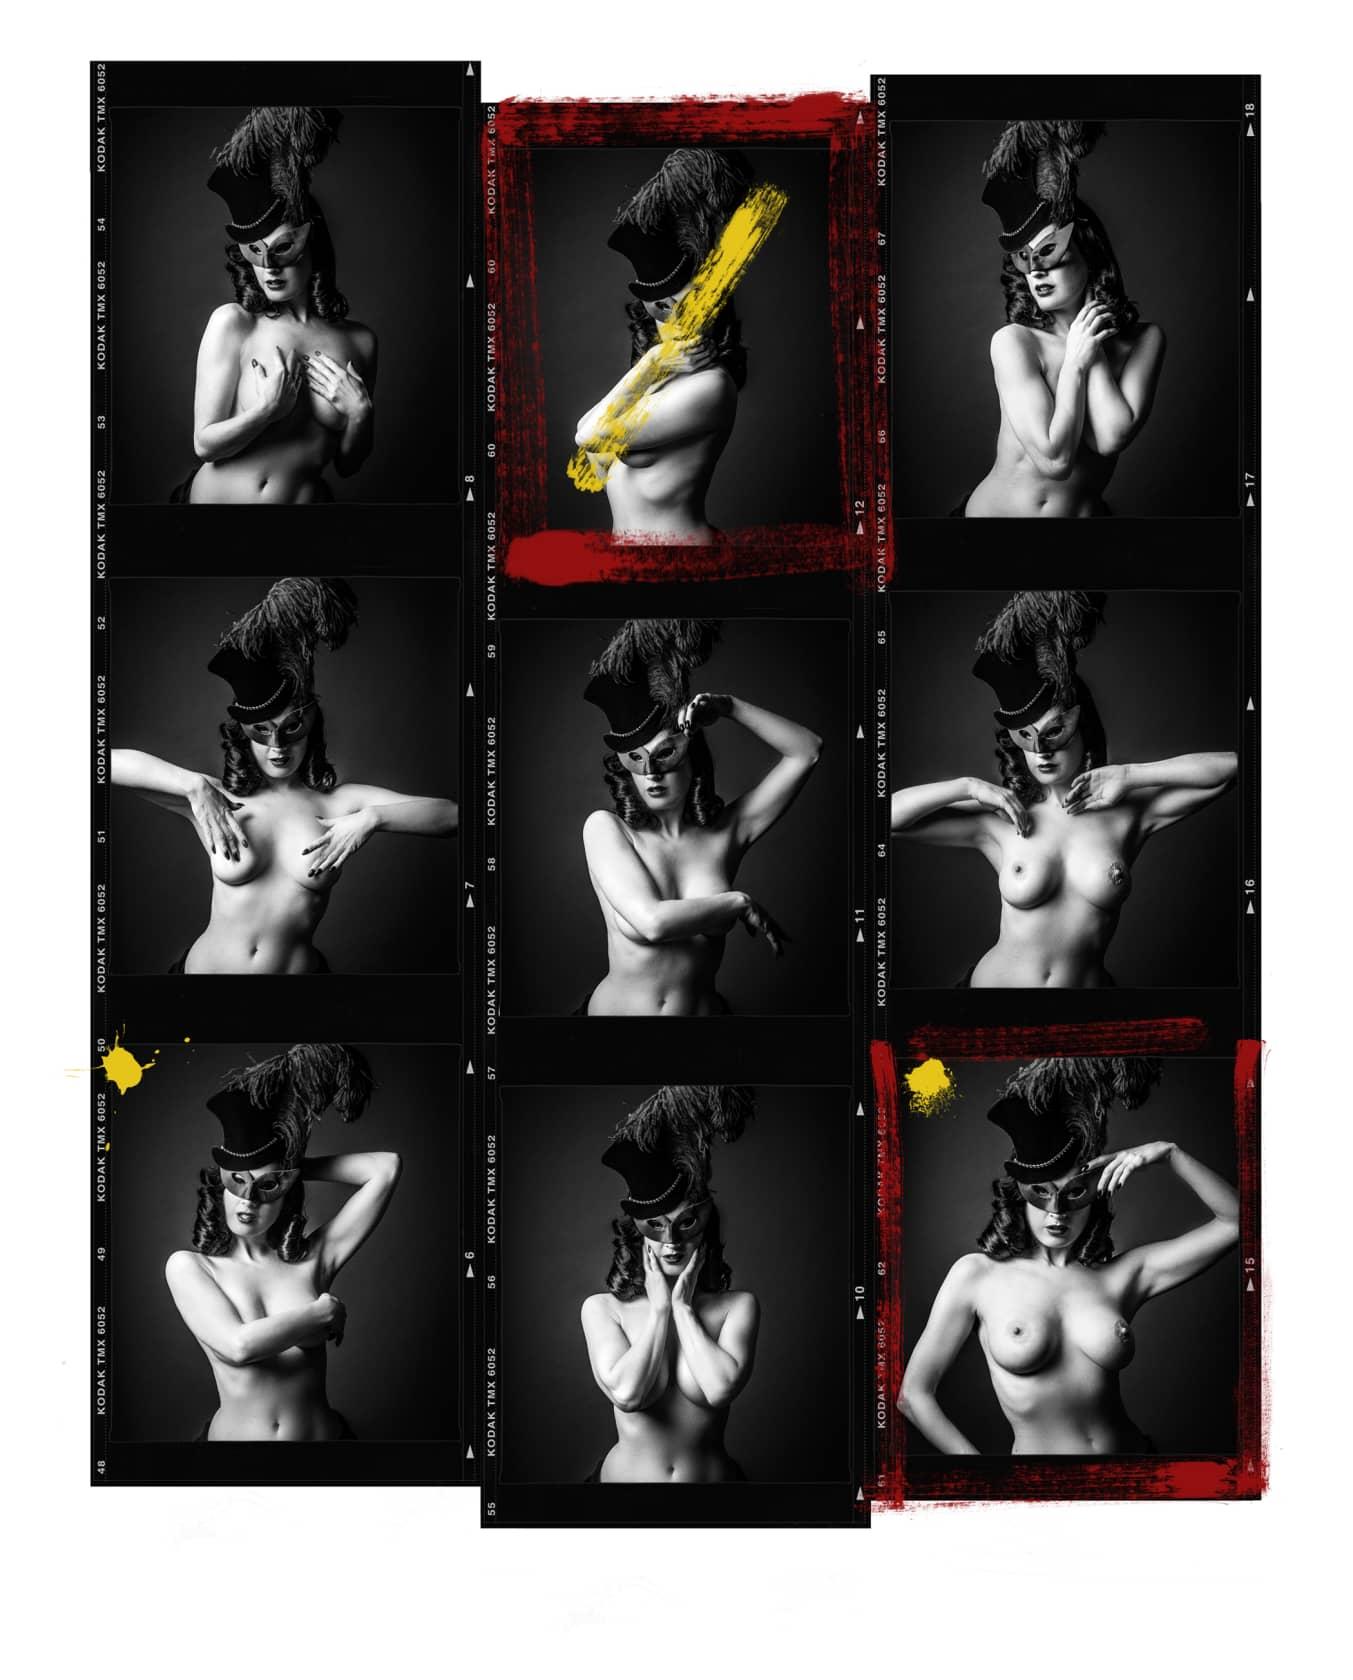 Andy Gotts Dita Von Teese Contact Sheet Fine Art Giclée Archival Print